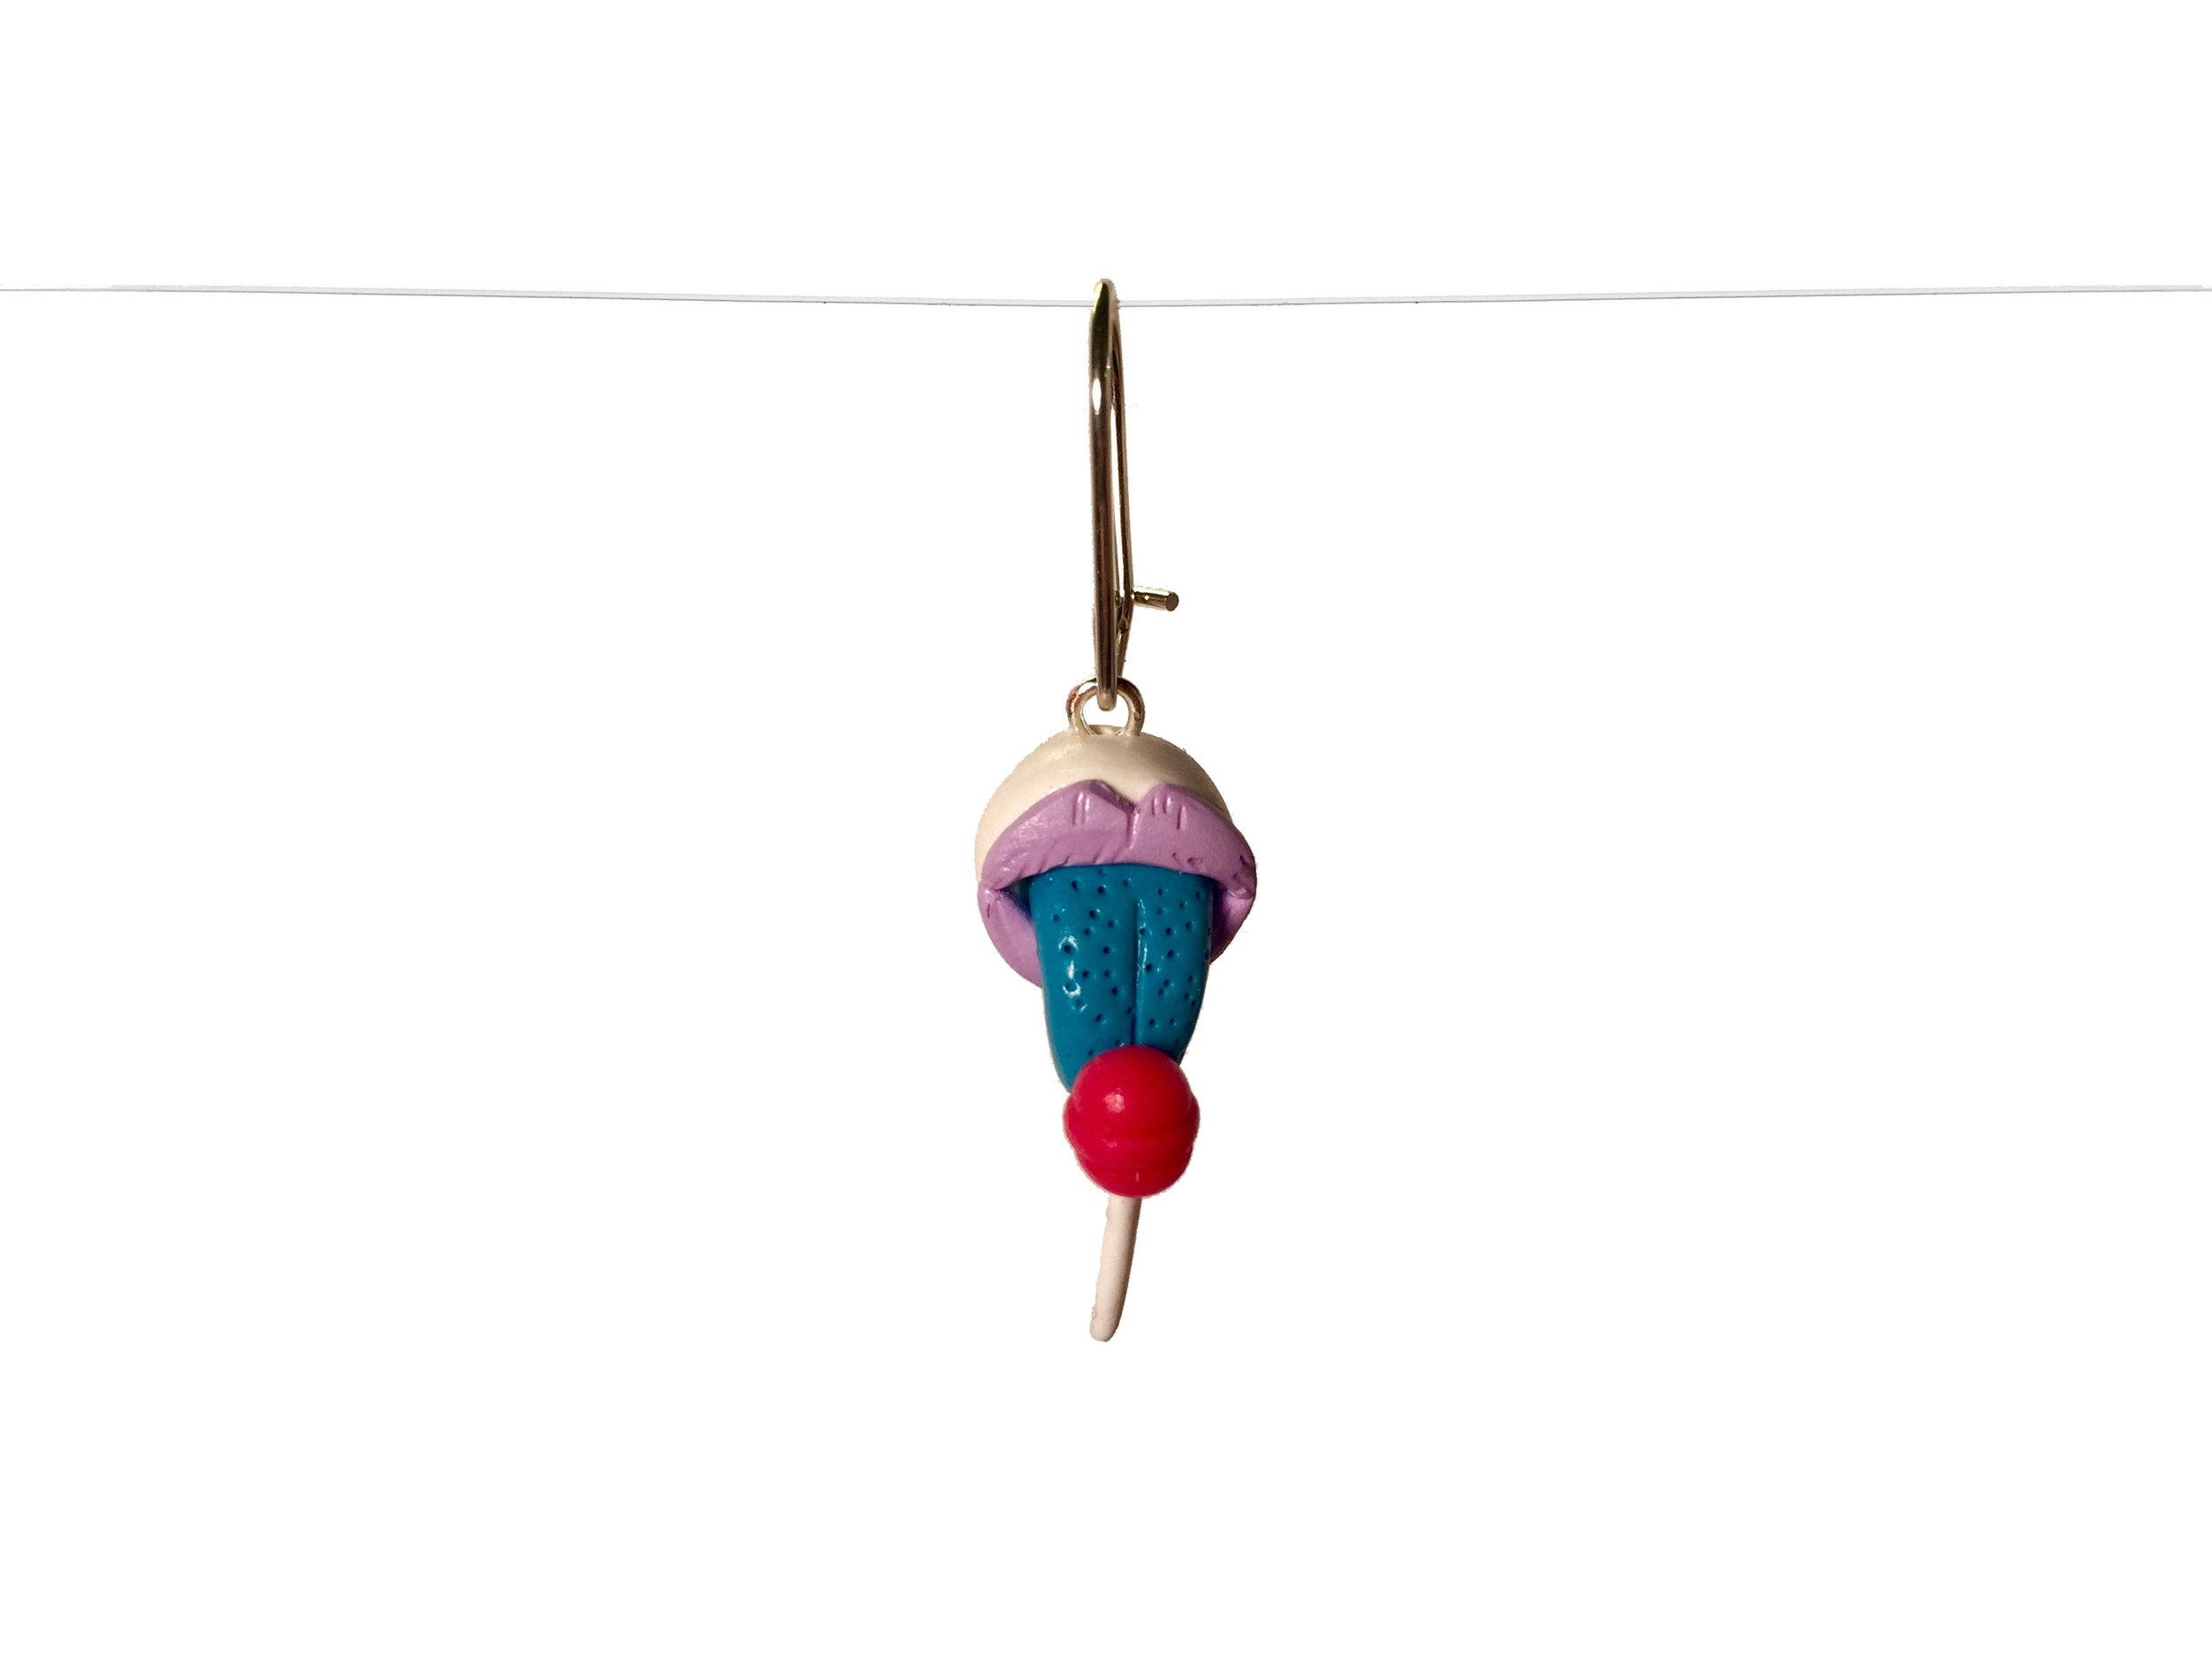 Lollipop Blue Tongue Polymer Clay Earring